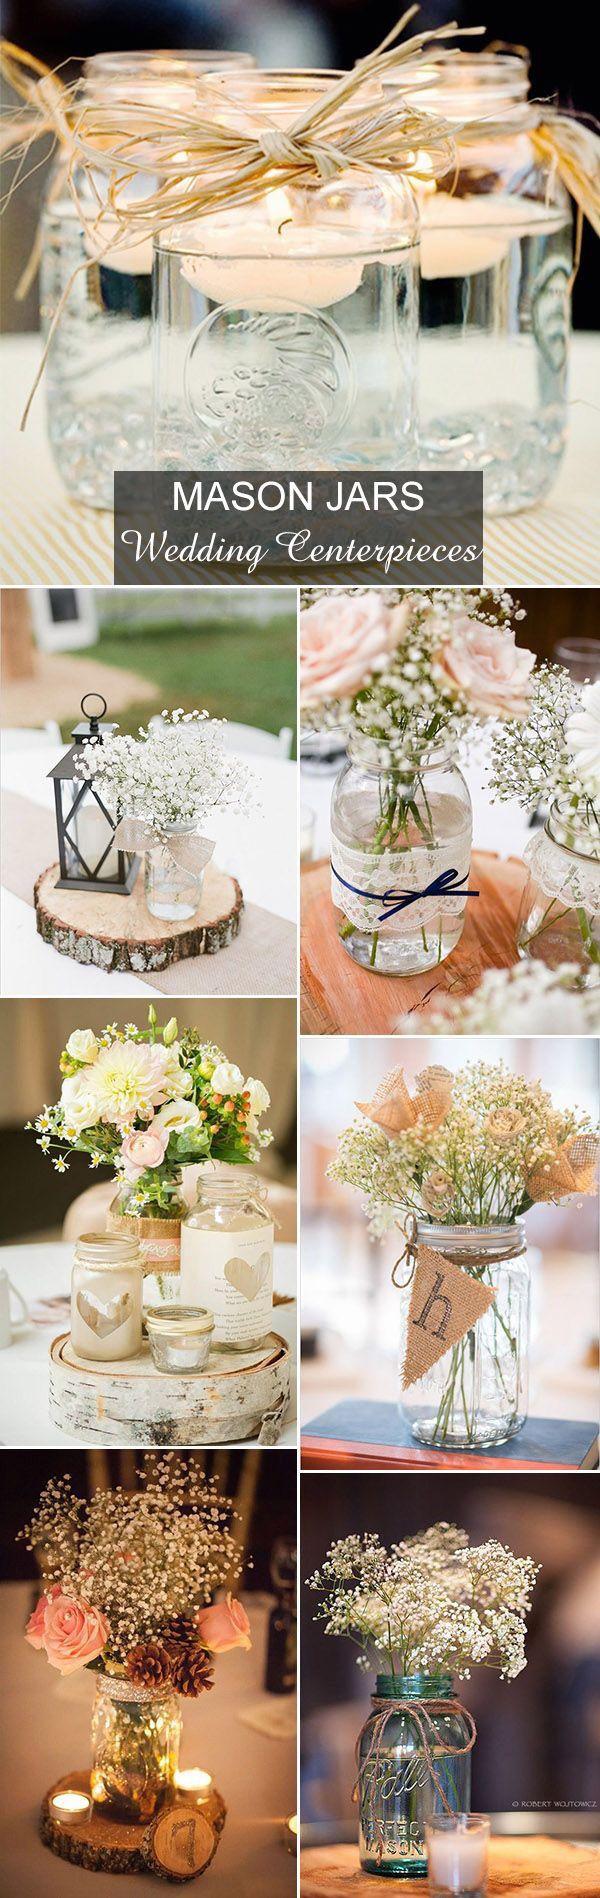 Wedding decor ideas simple  Mason jars  Bridal Collection  Pinterest  Jar Wedding and Weddings